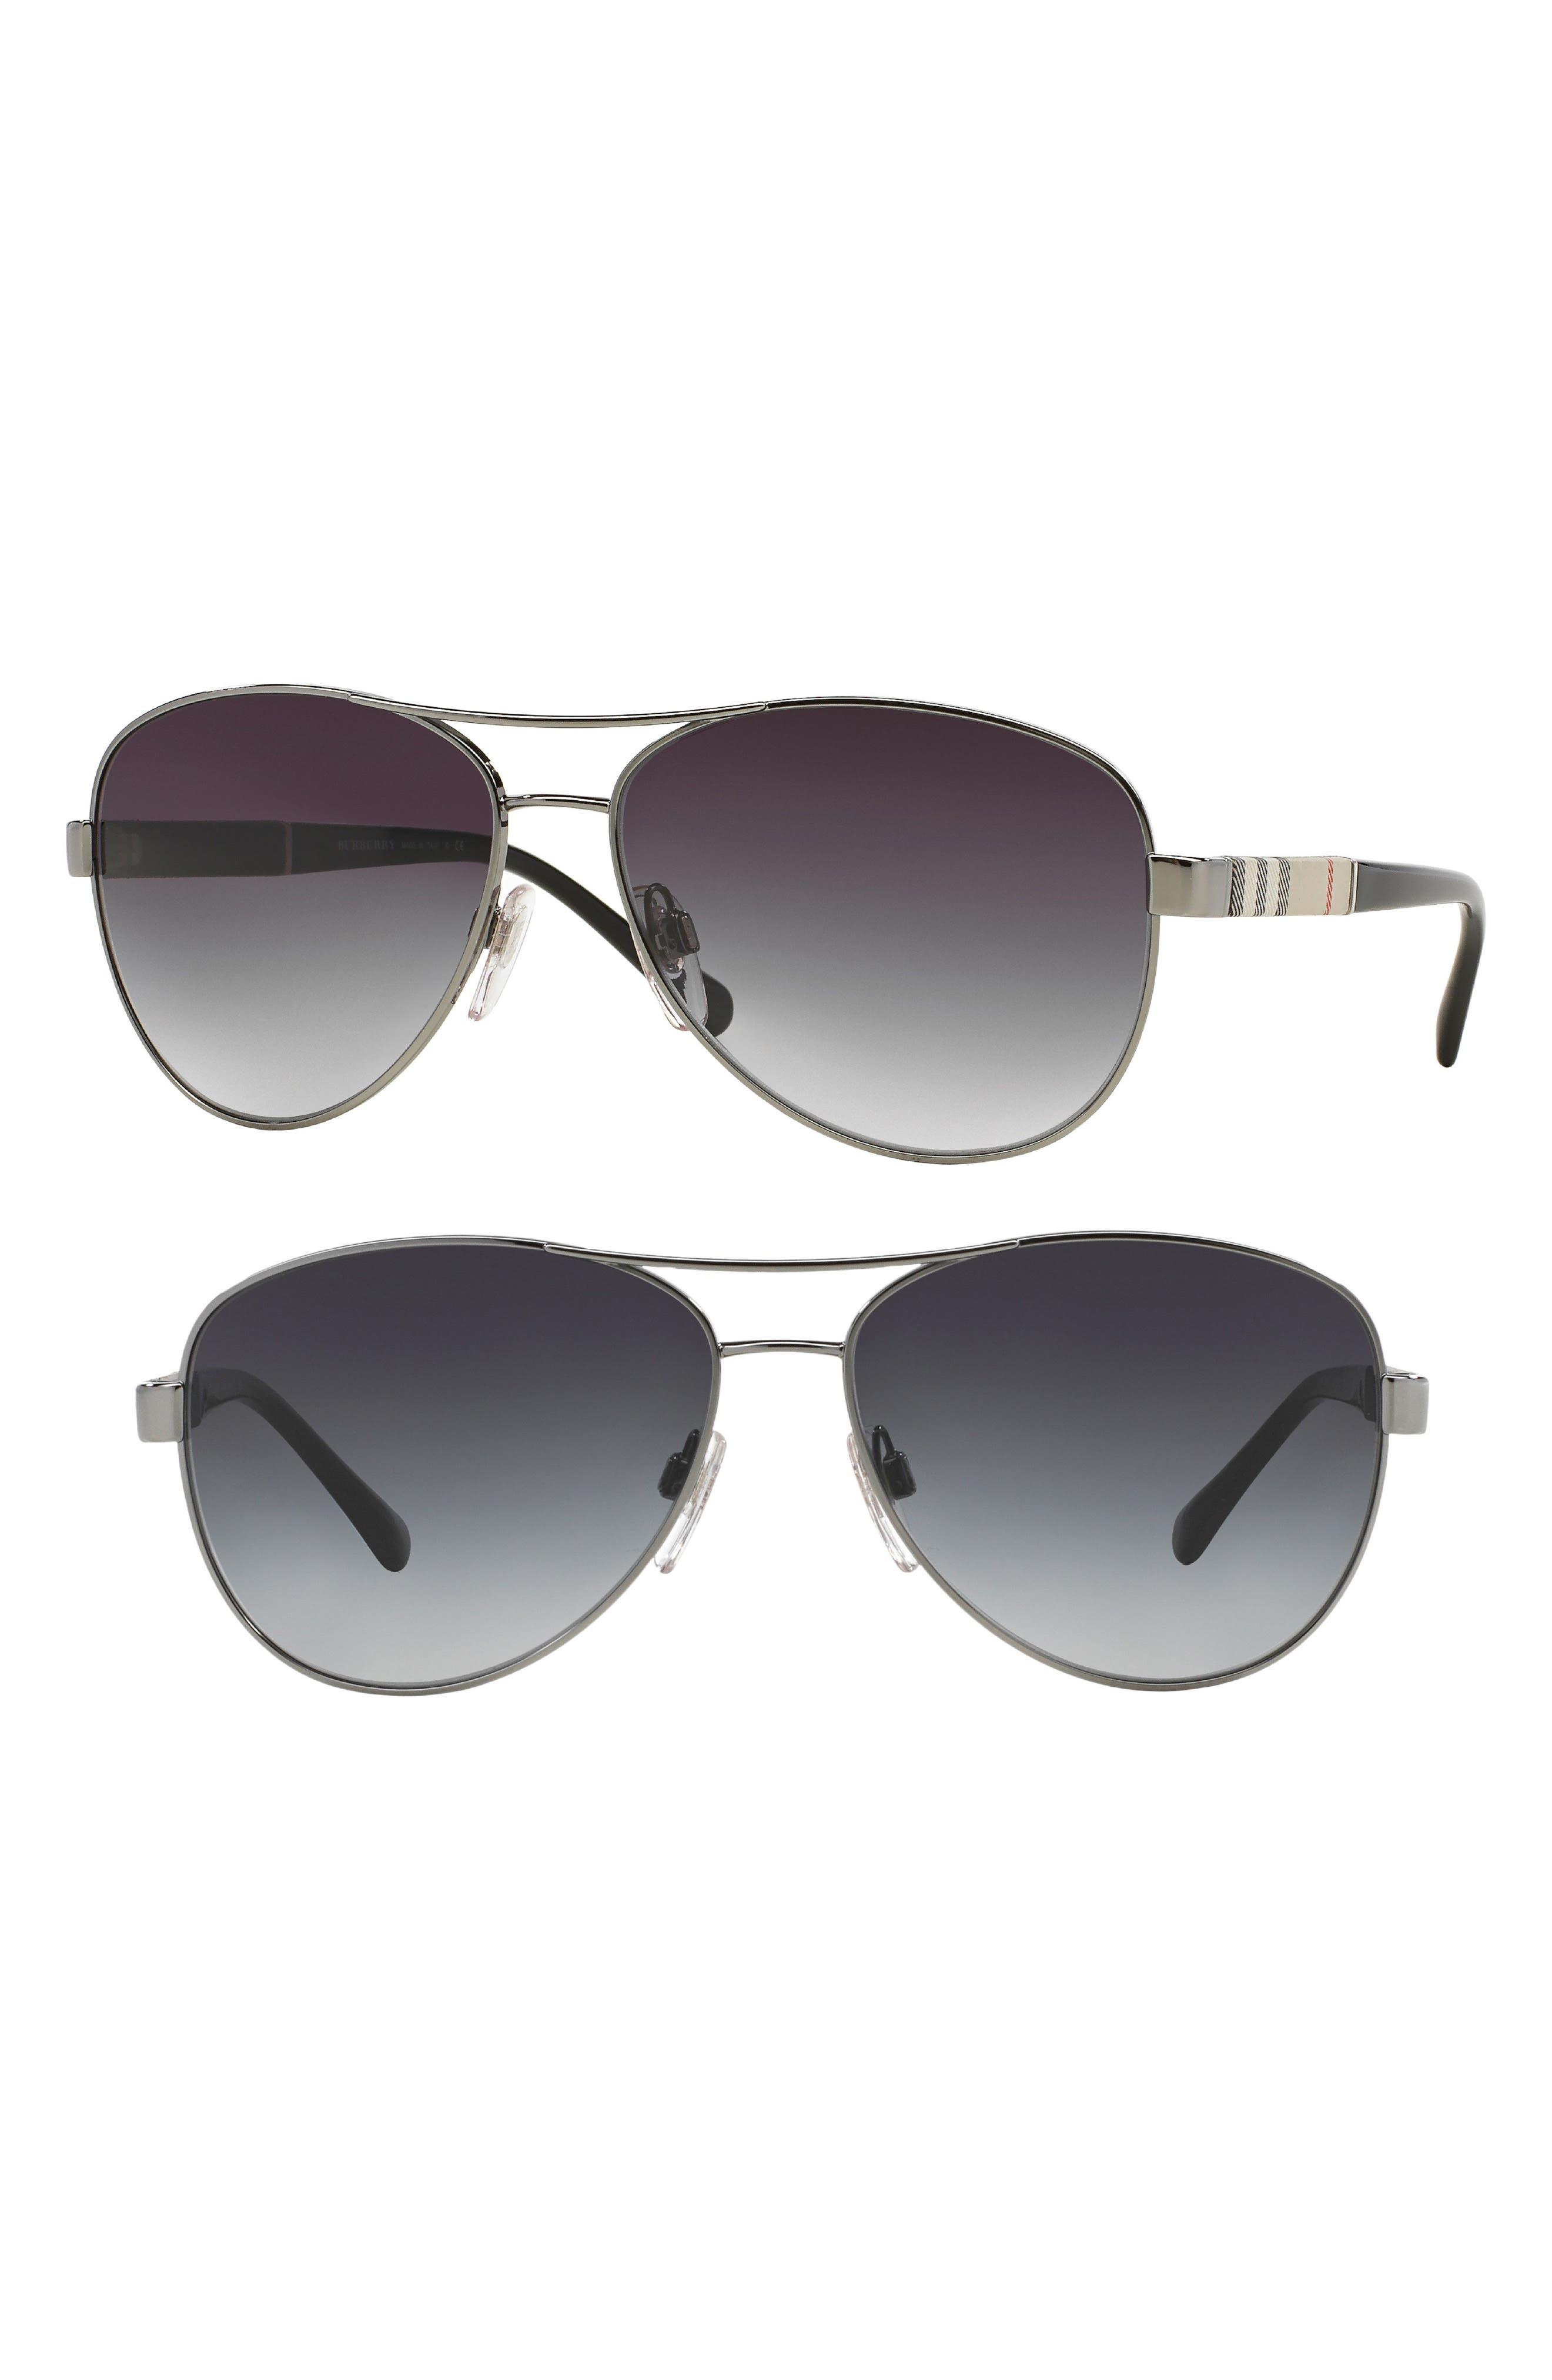 59mm Aviator Sunglasses,                         Main,                         color, 710